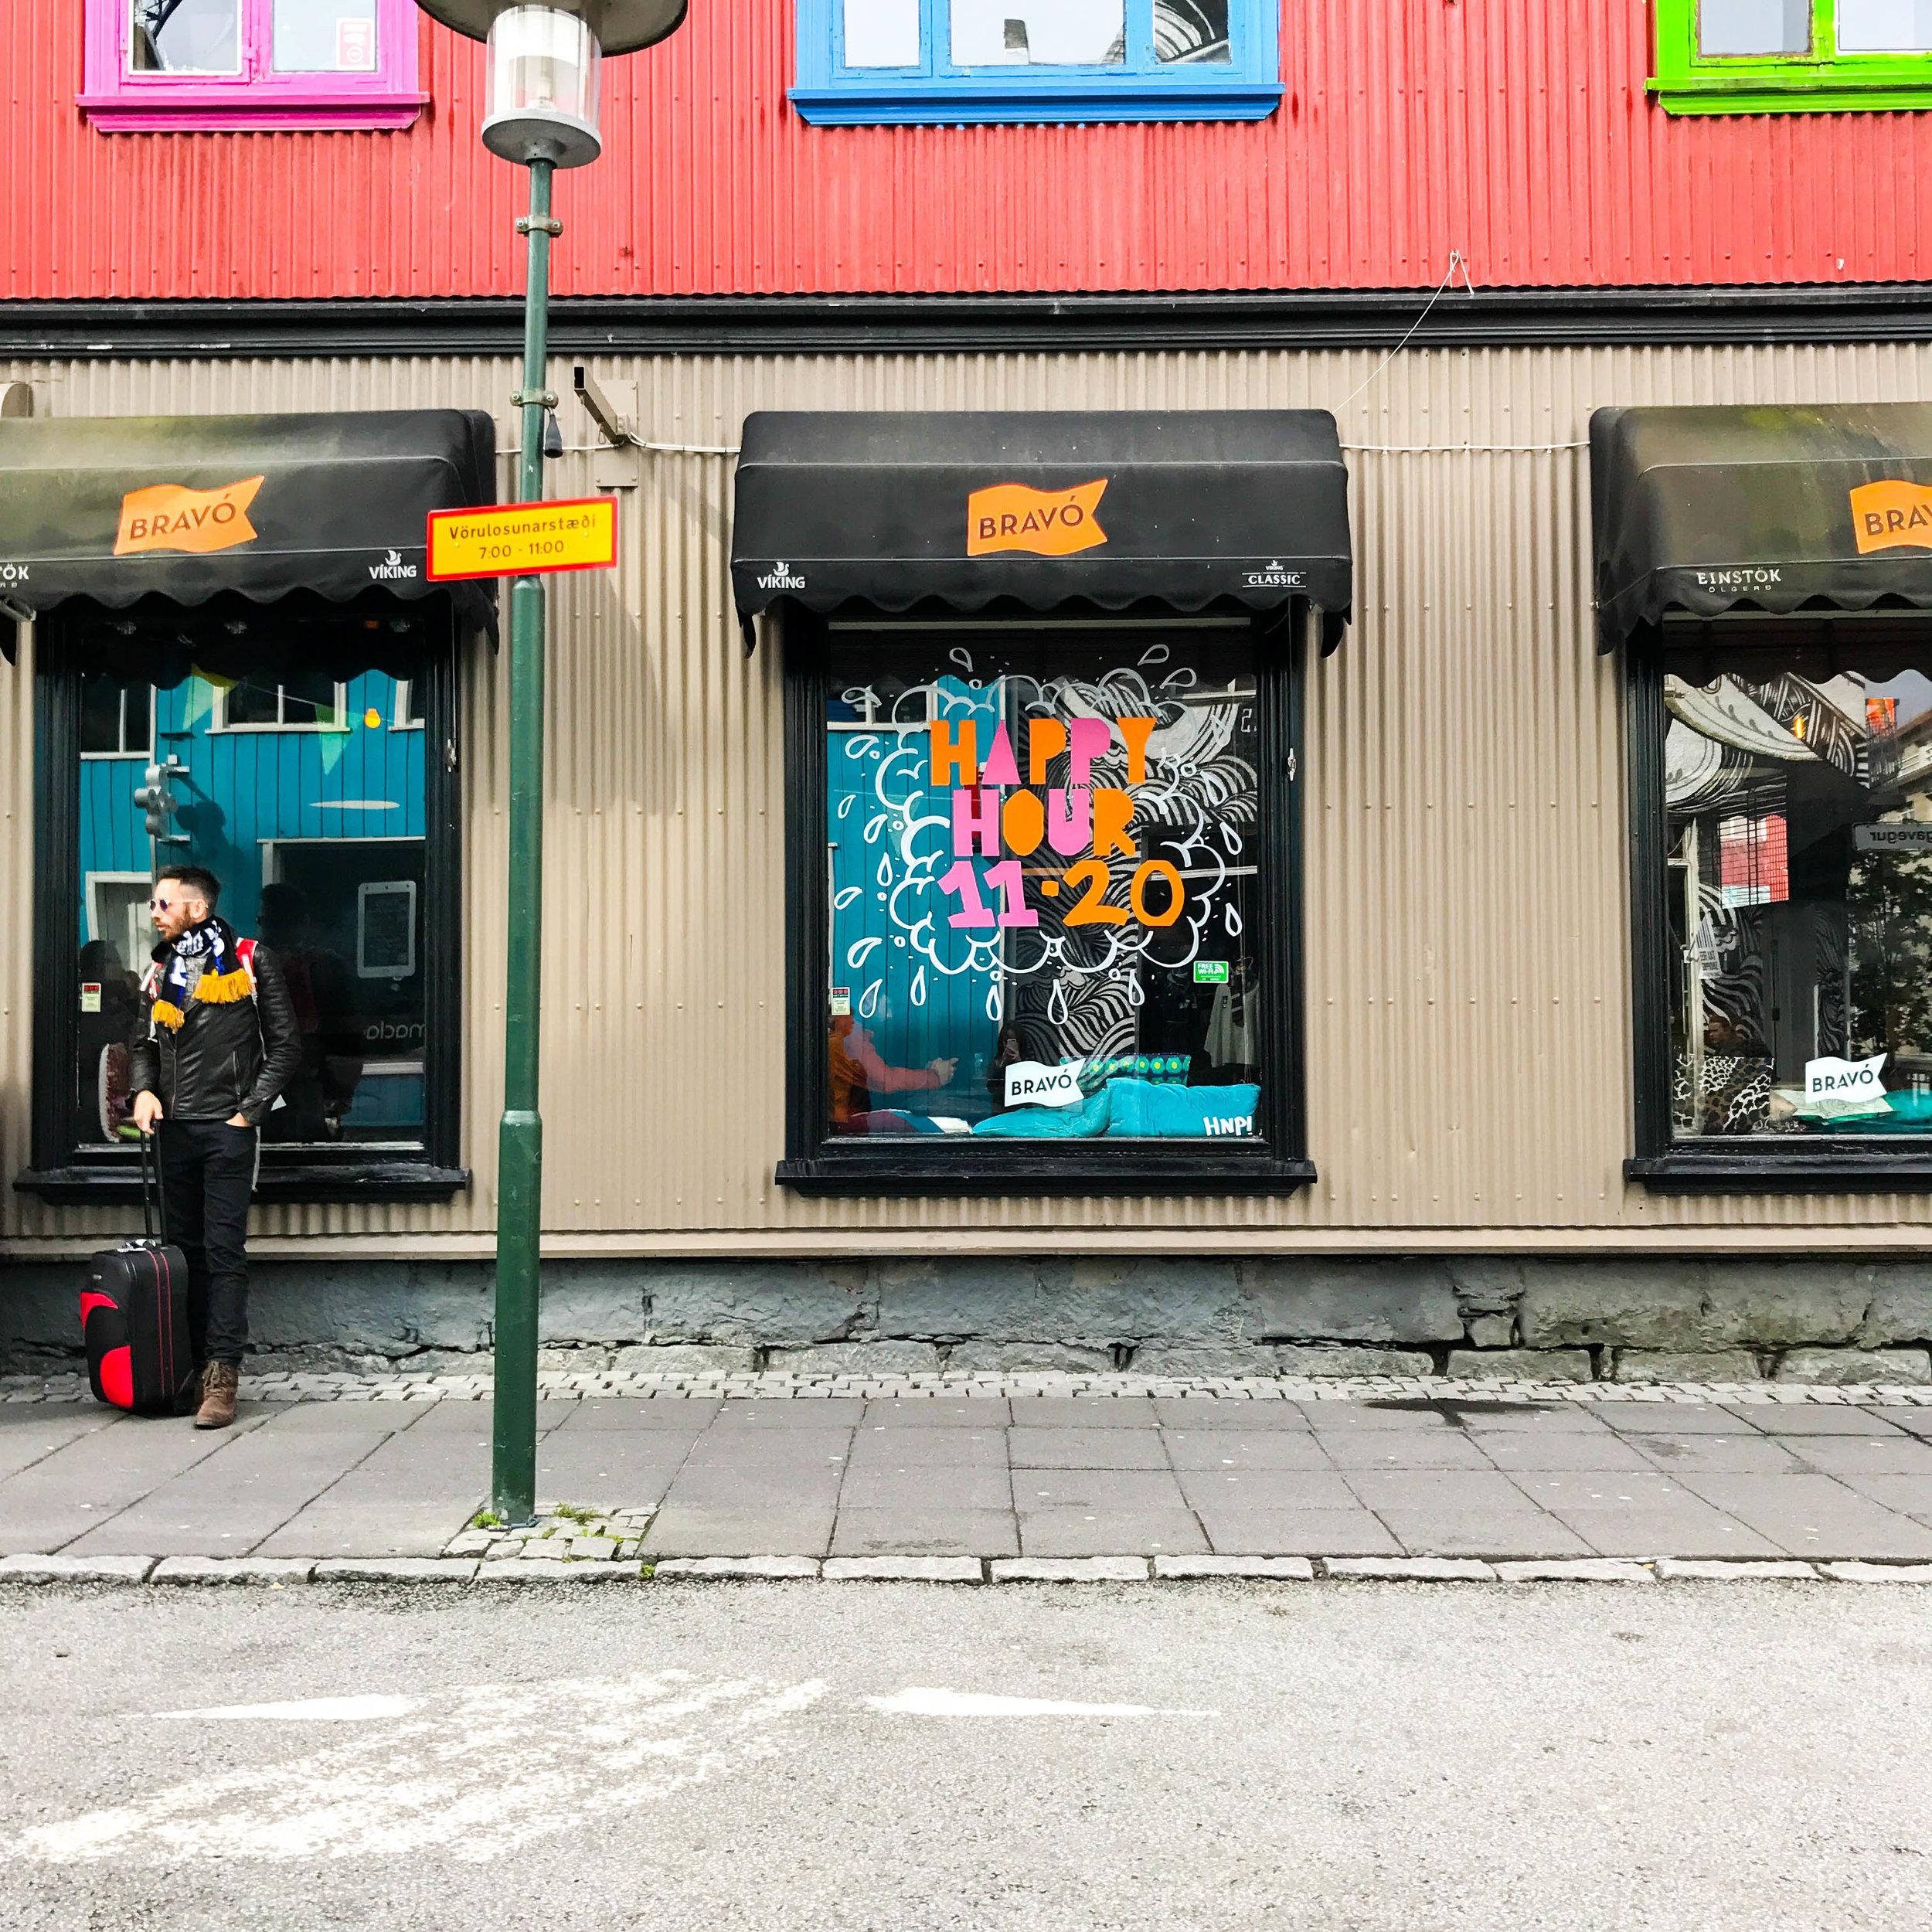 Downtown Reykjavik